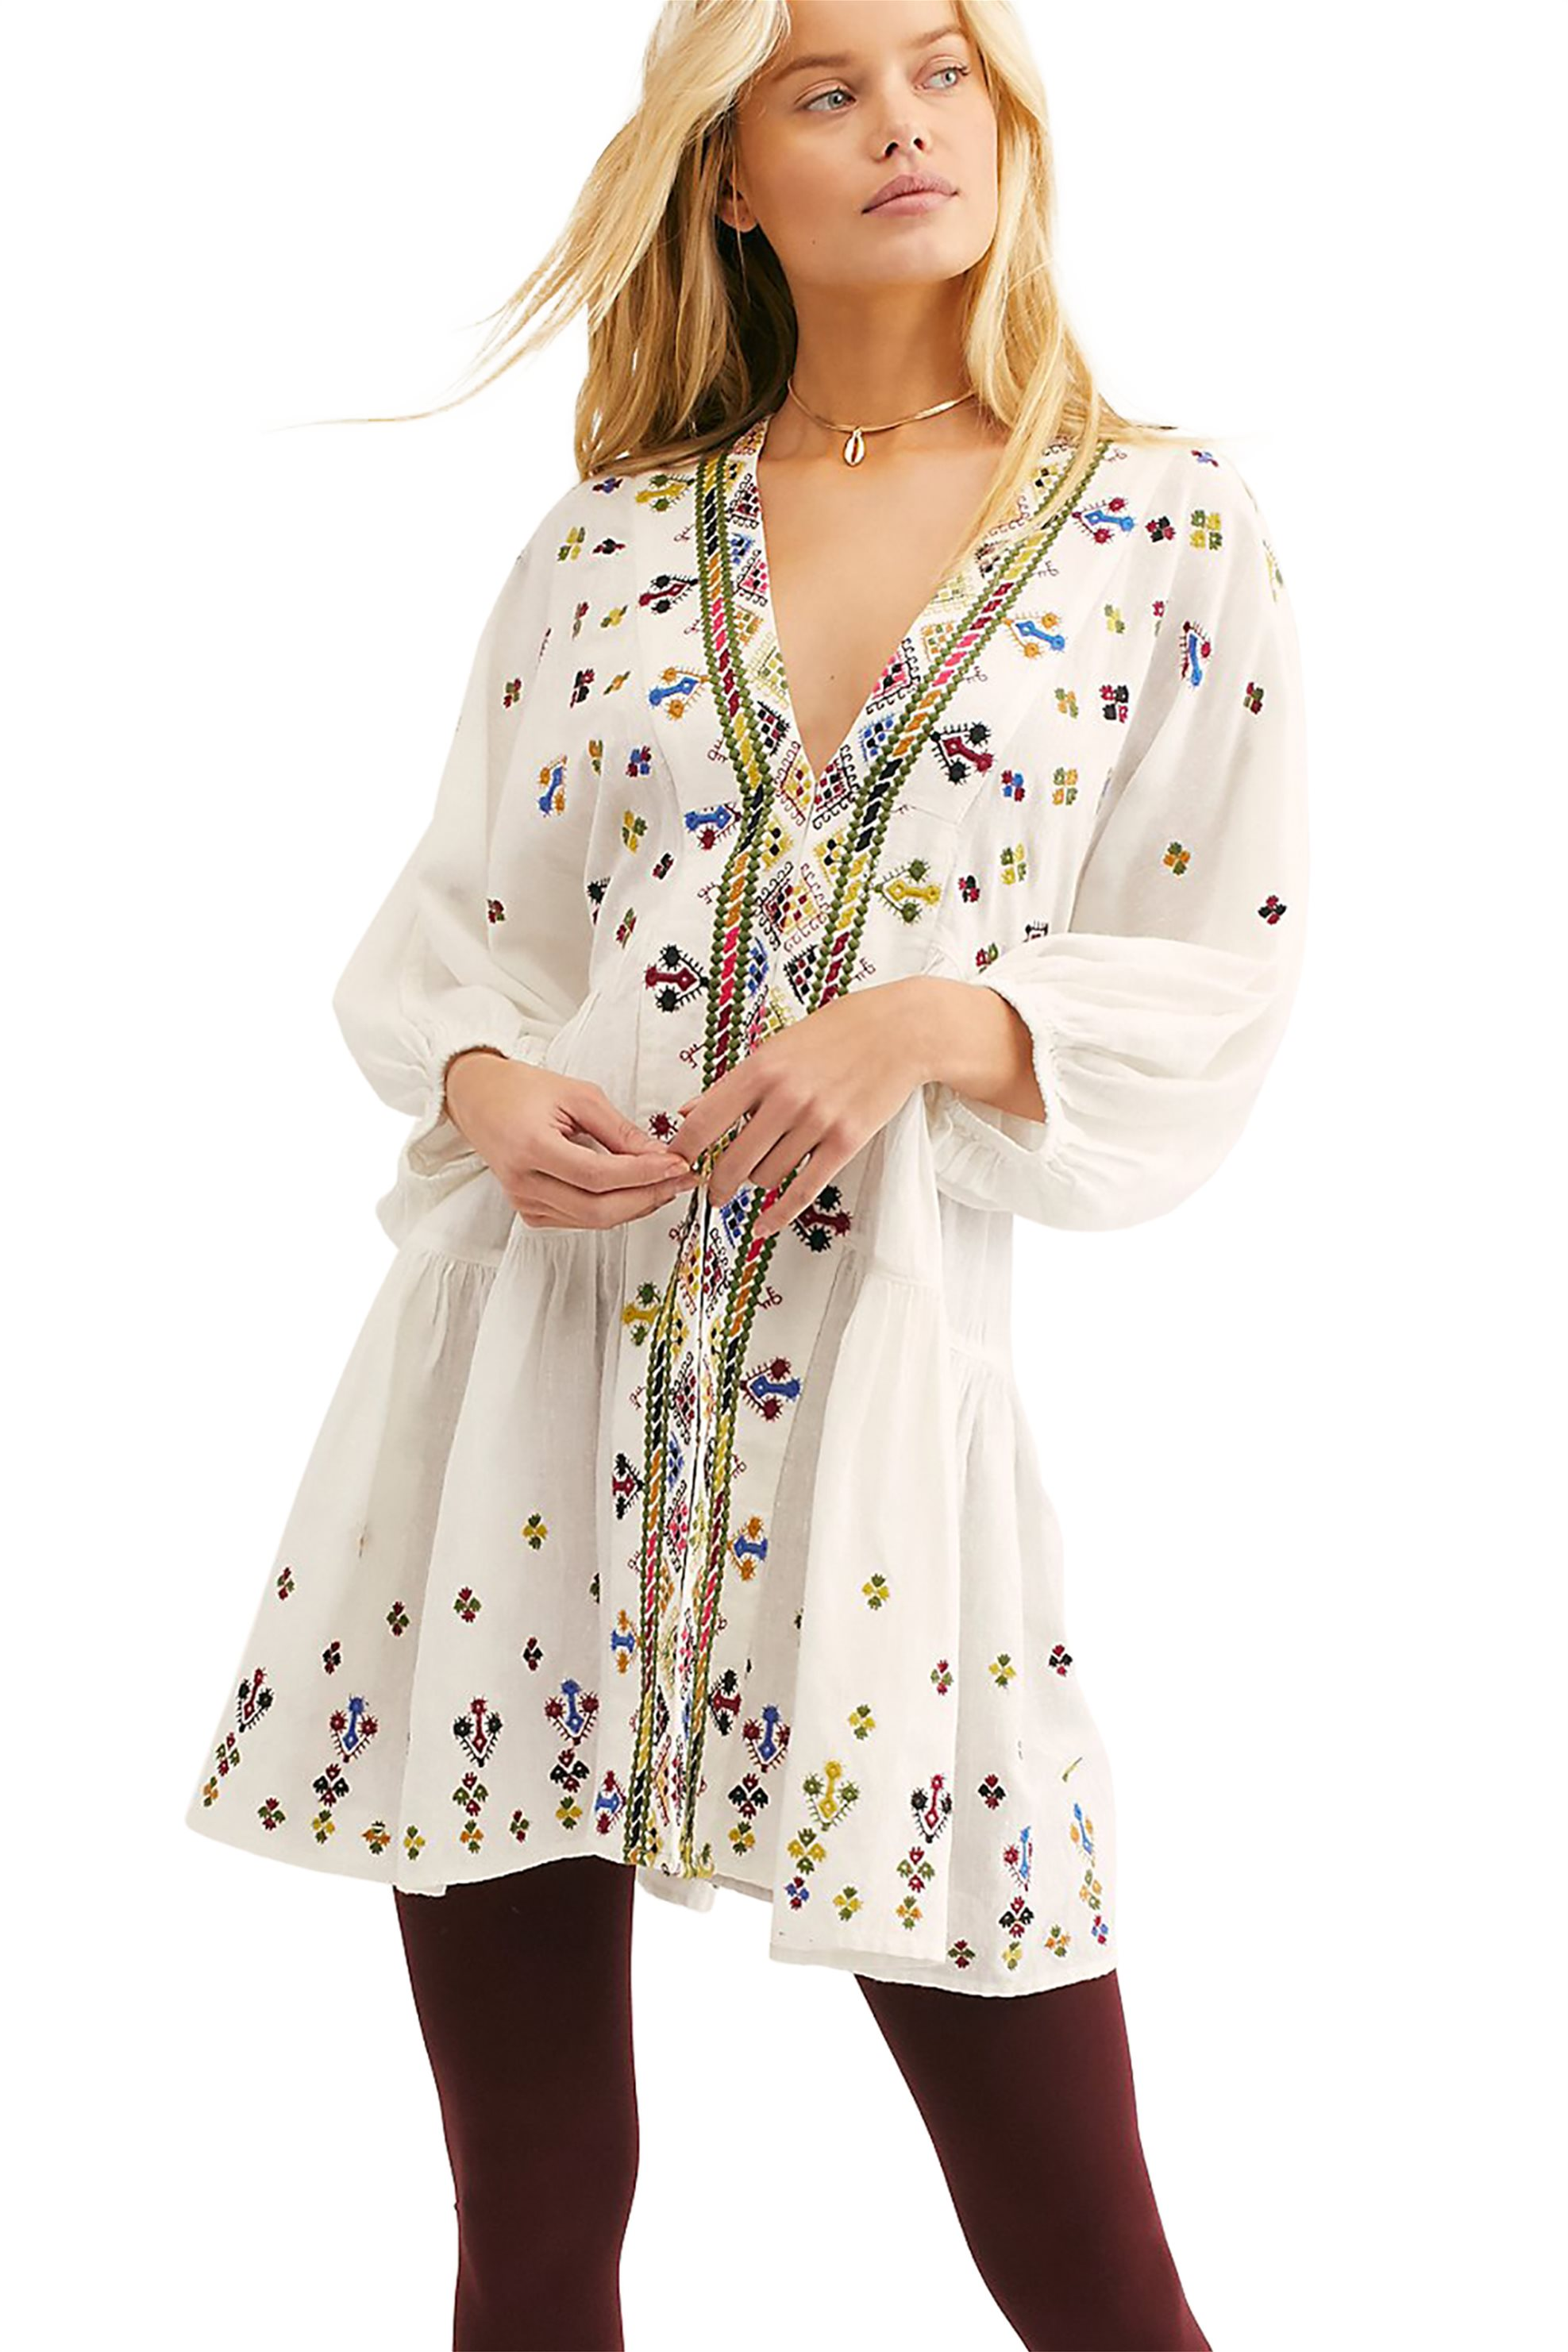 db6e96b4f3c3 Free People γυναικείο φόρεμα τουνίκ Light It Up Embroidered - OB915883 -  Λευκό